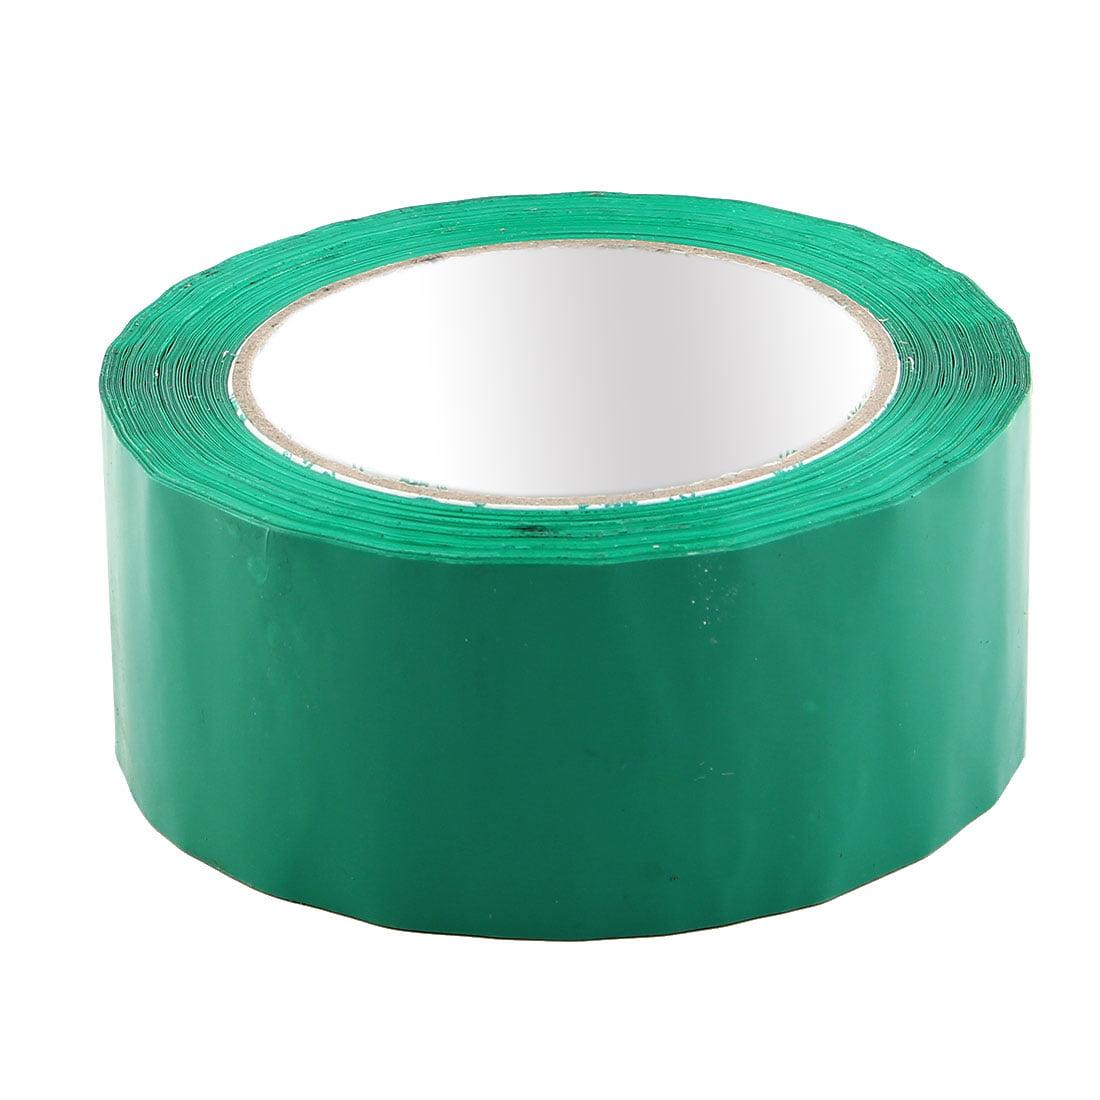 Shipping PVC Box Sealing Adhesive Tape Dark Green 1.9'' x 98.4 Yards(295.3 Ft)